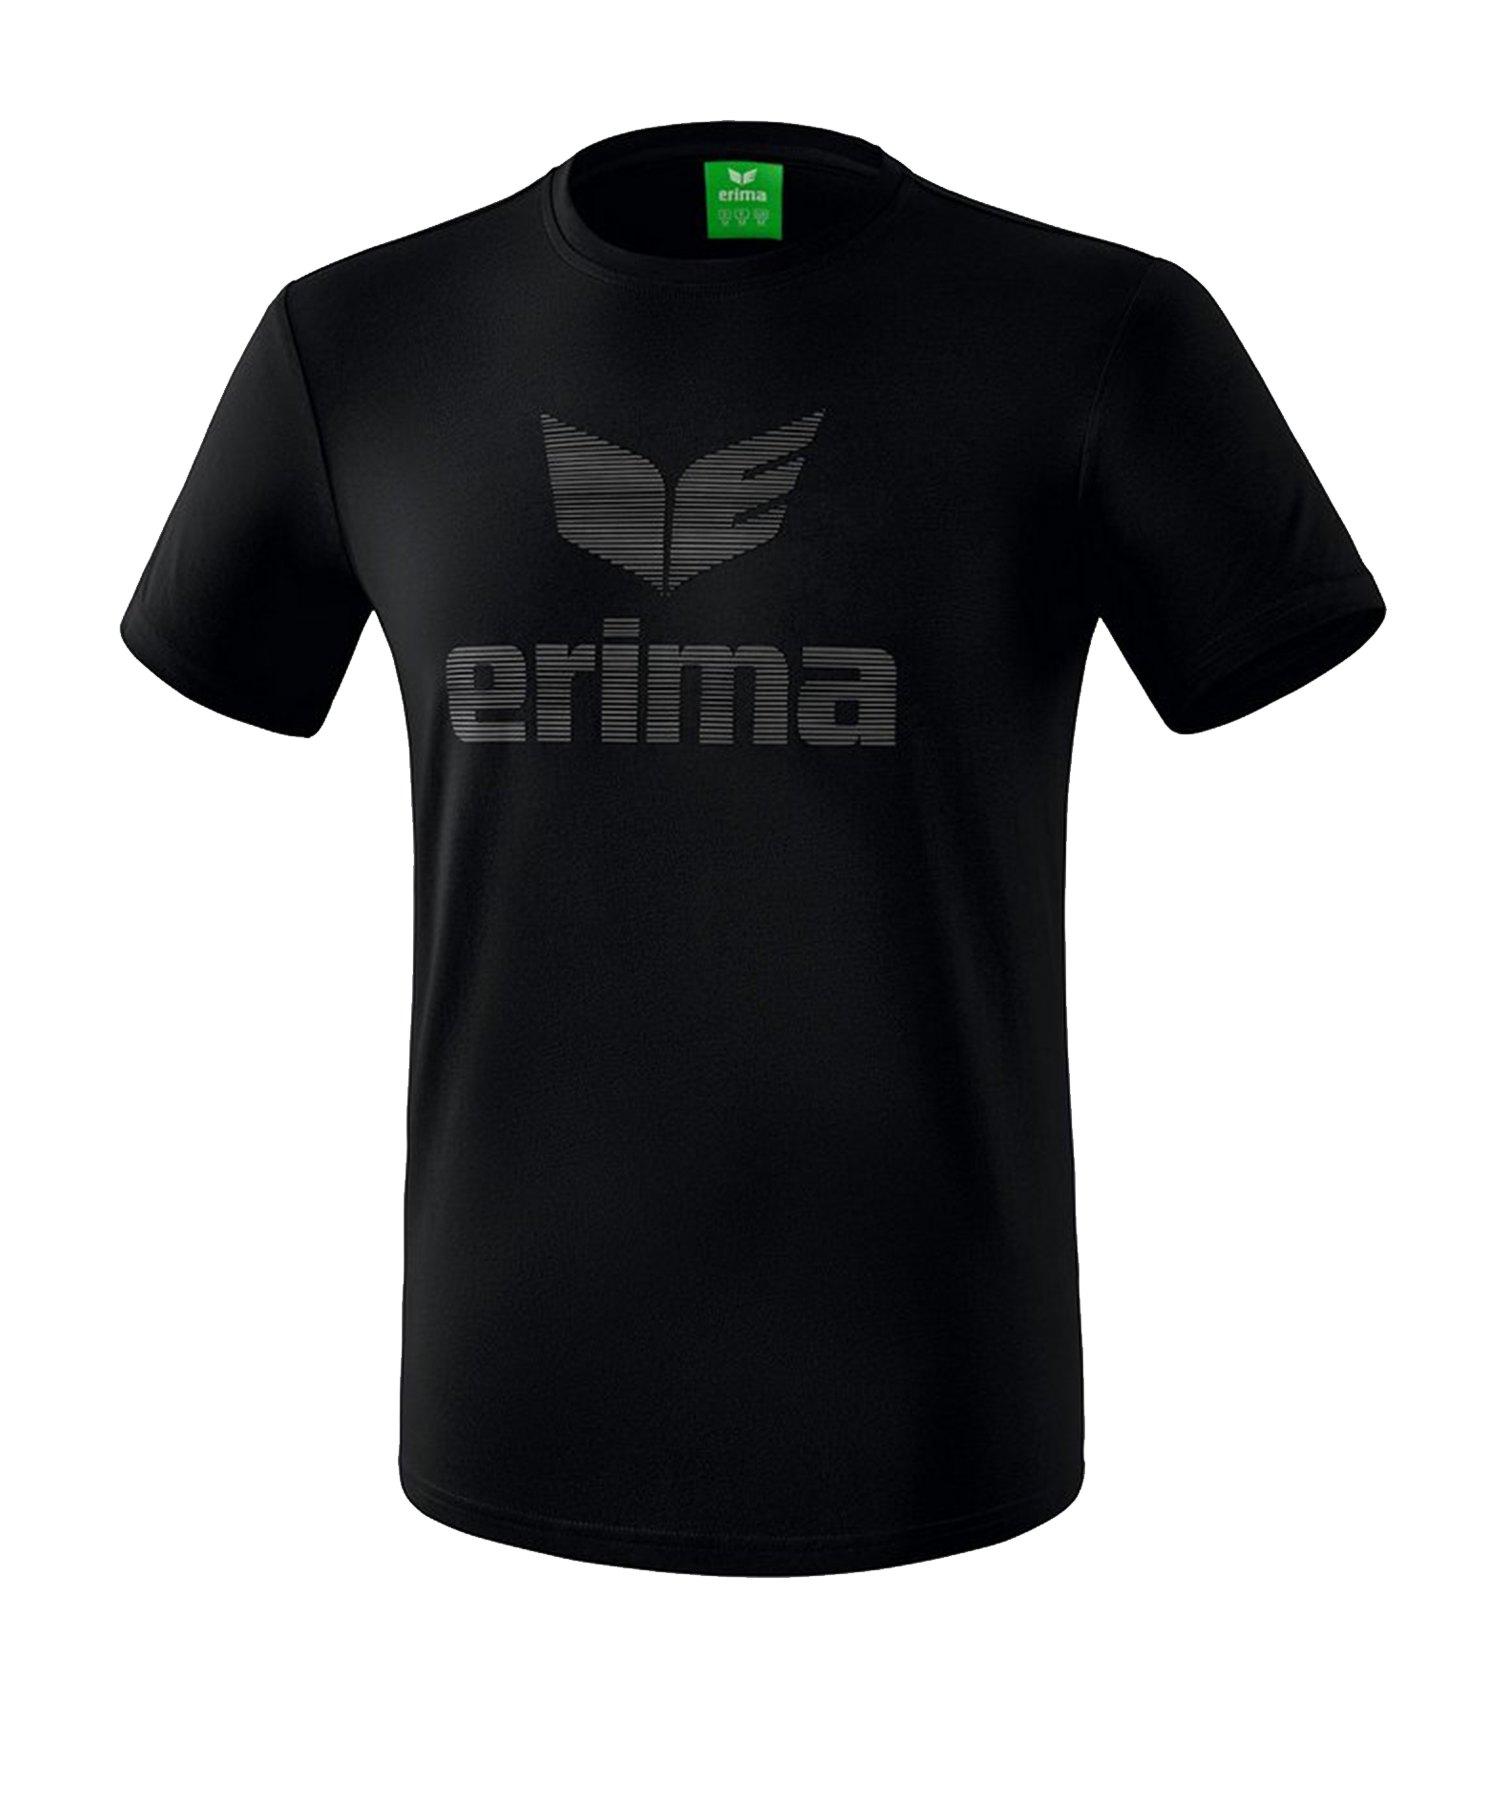 Erima Essential T-Shirt Schwarz Grau - Schwarz